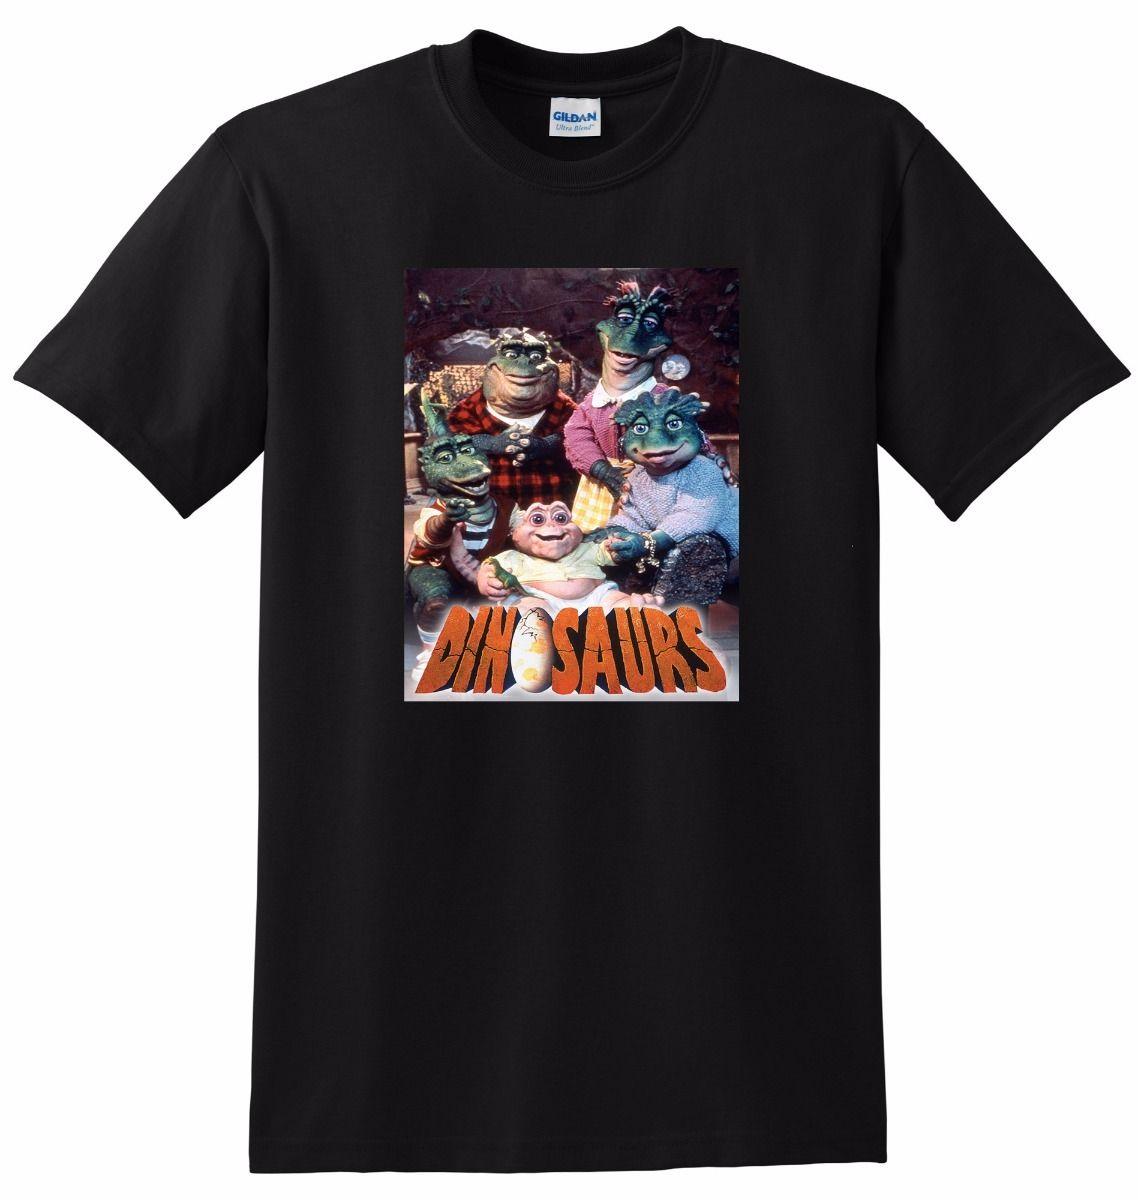 Dinosaurs T Shirt Tv Show Season 1 2 3 Small Medium